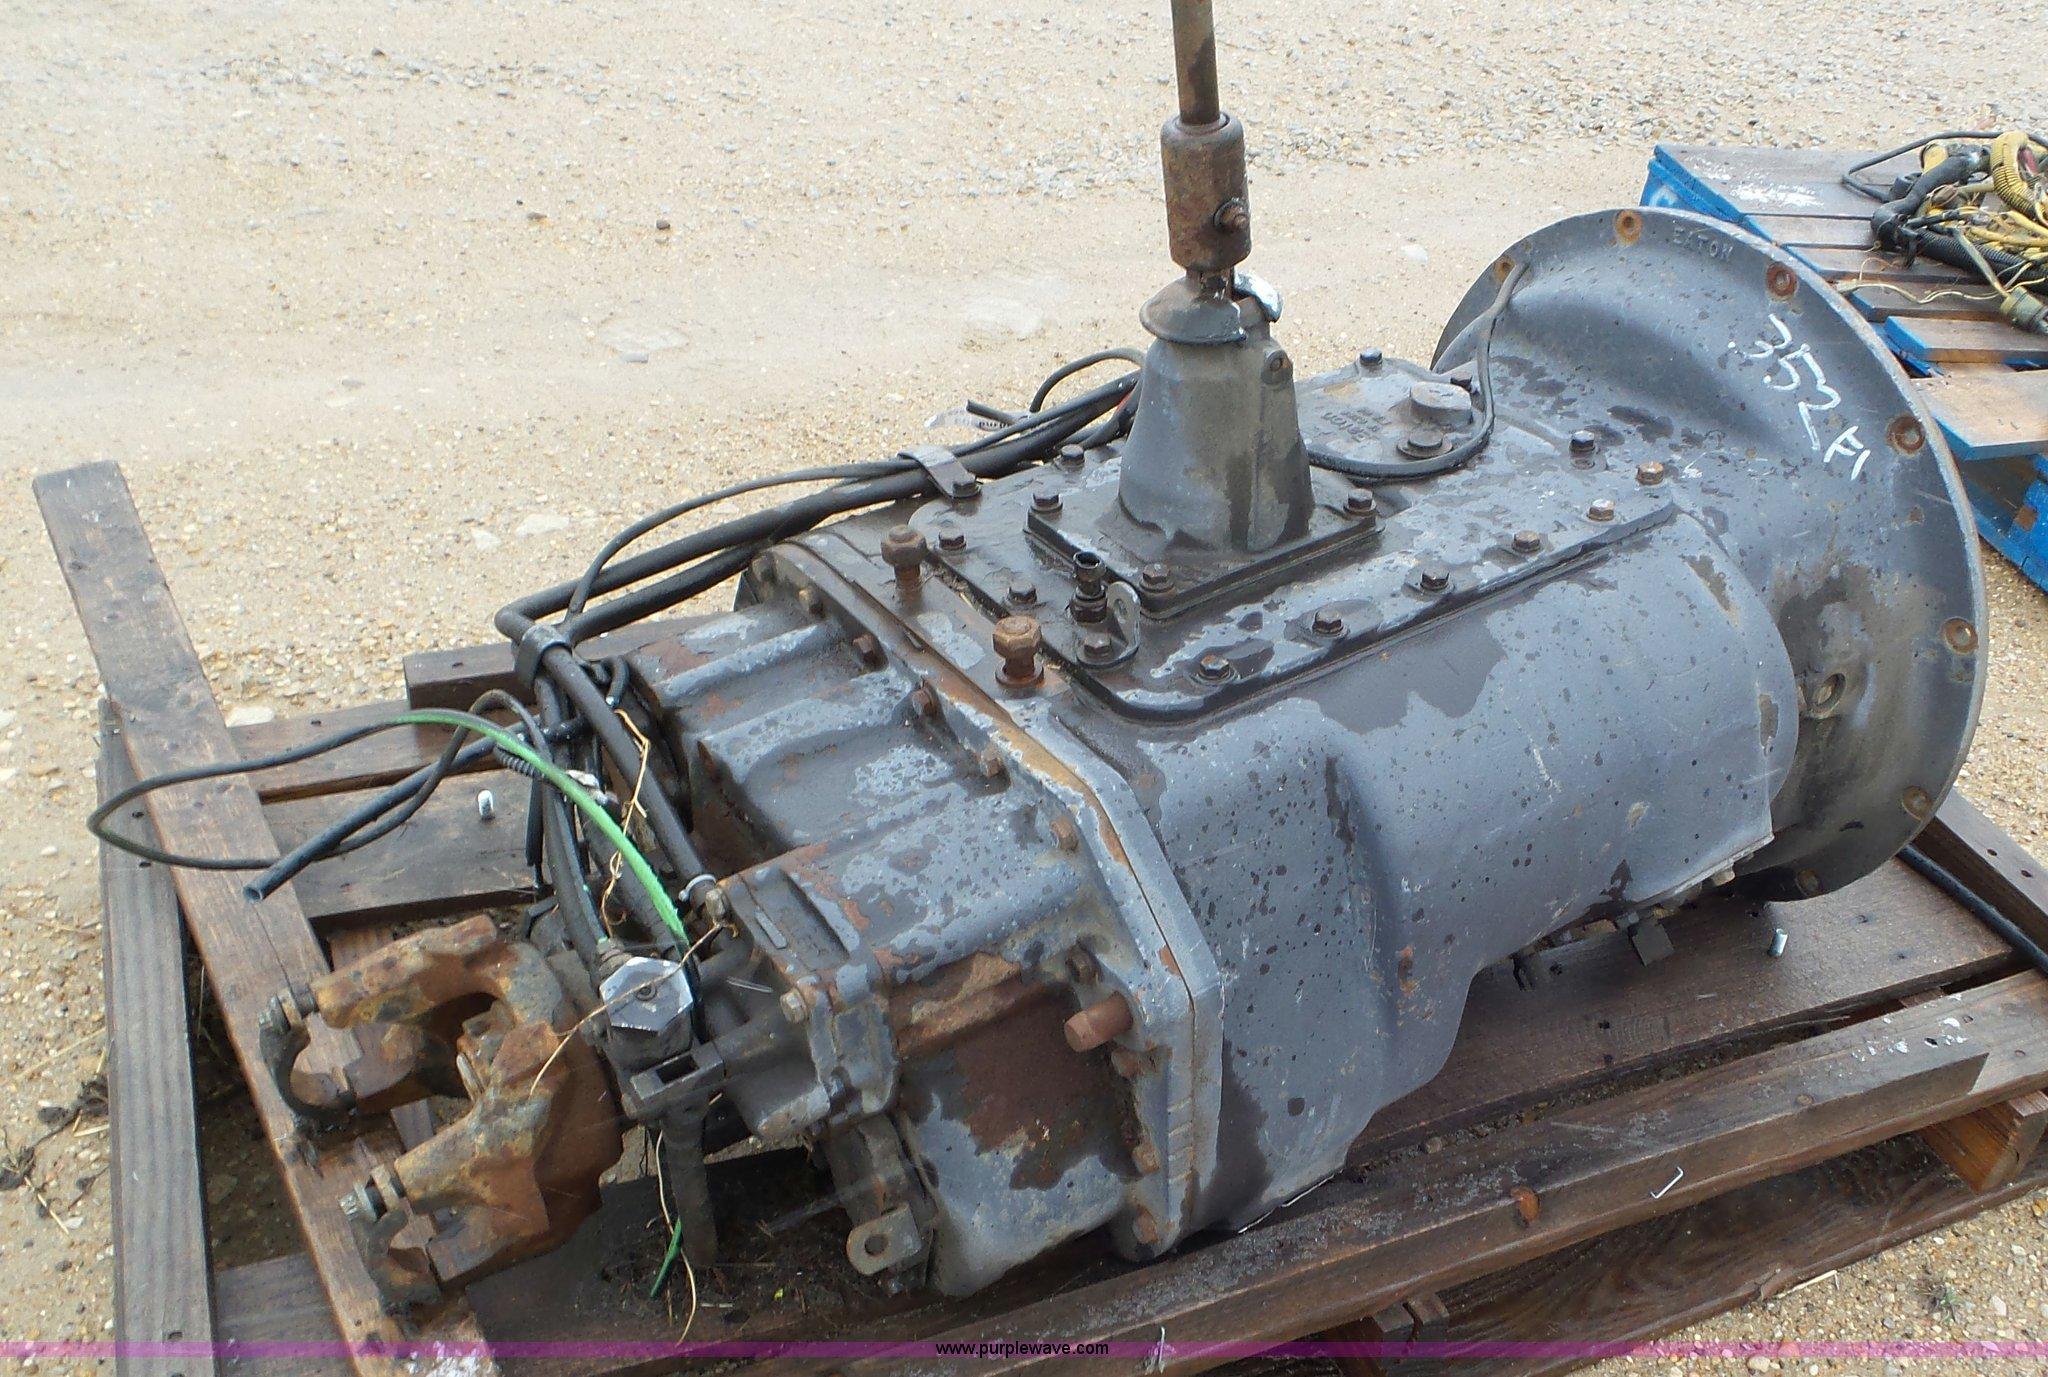 fuller 13 speed transmission diagram ac condenser fan motor wiring eaton manual item av9803 so full size in new window